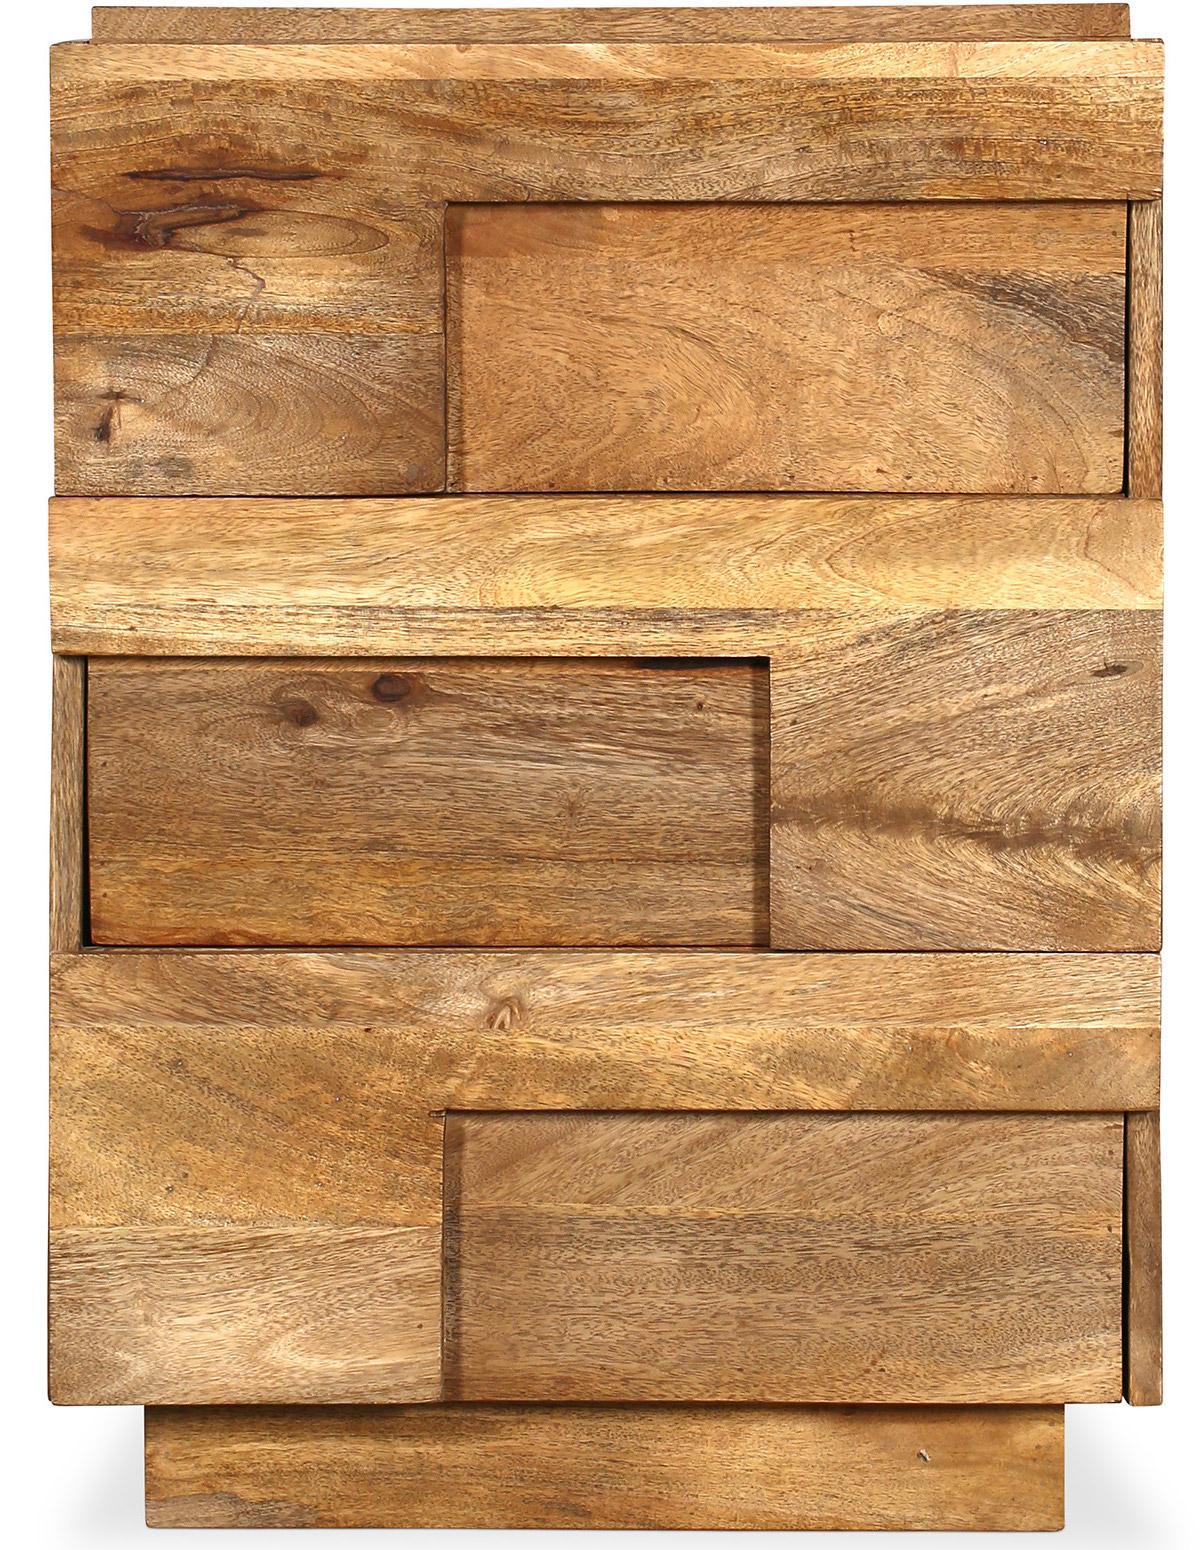 bahut 3 tiroirs bois de manguier thali. Black Bedroom Furniture Sets. Home Design Ideas